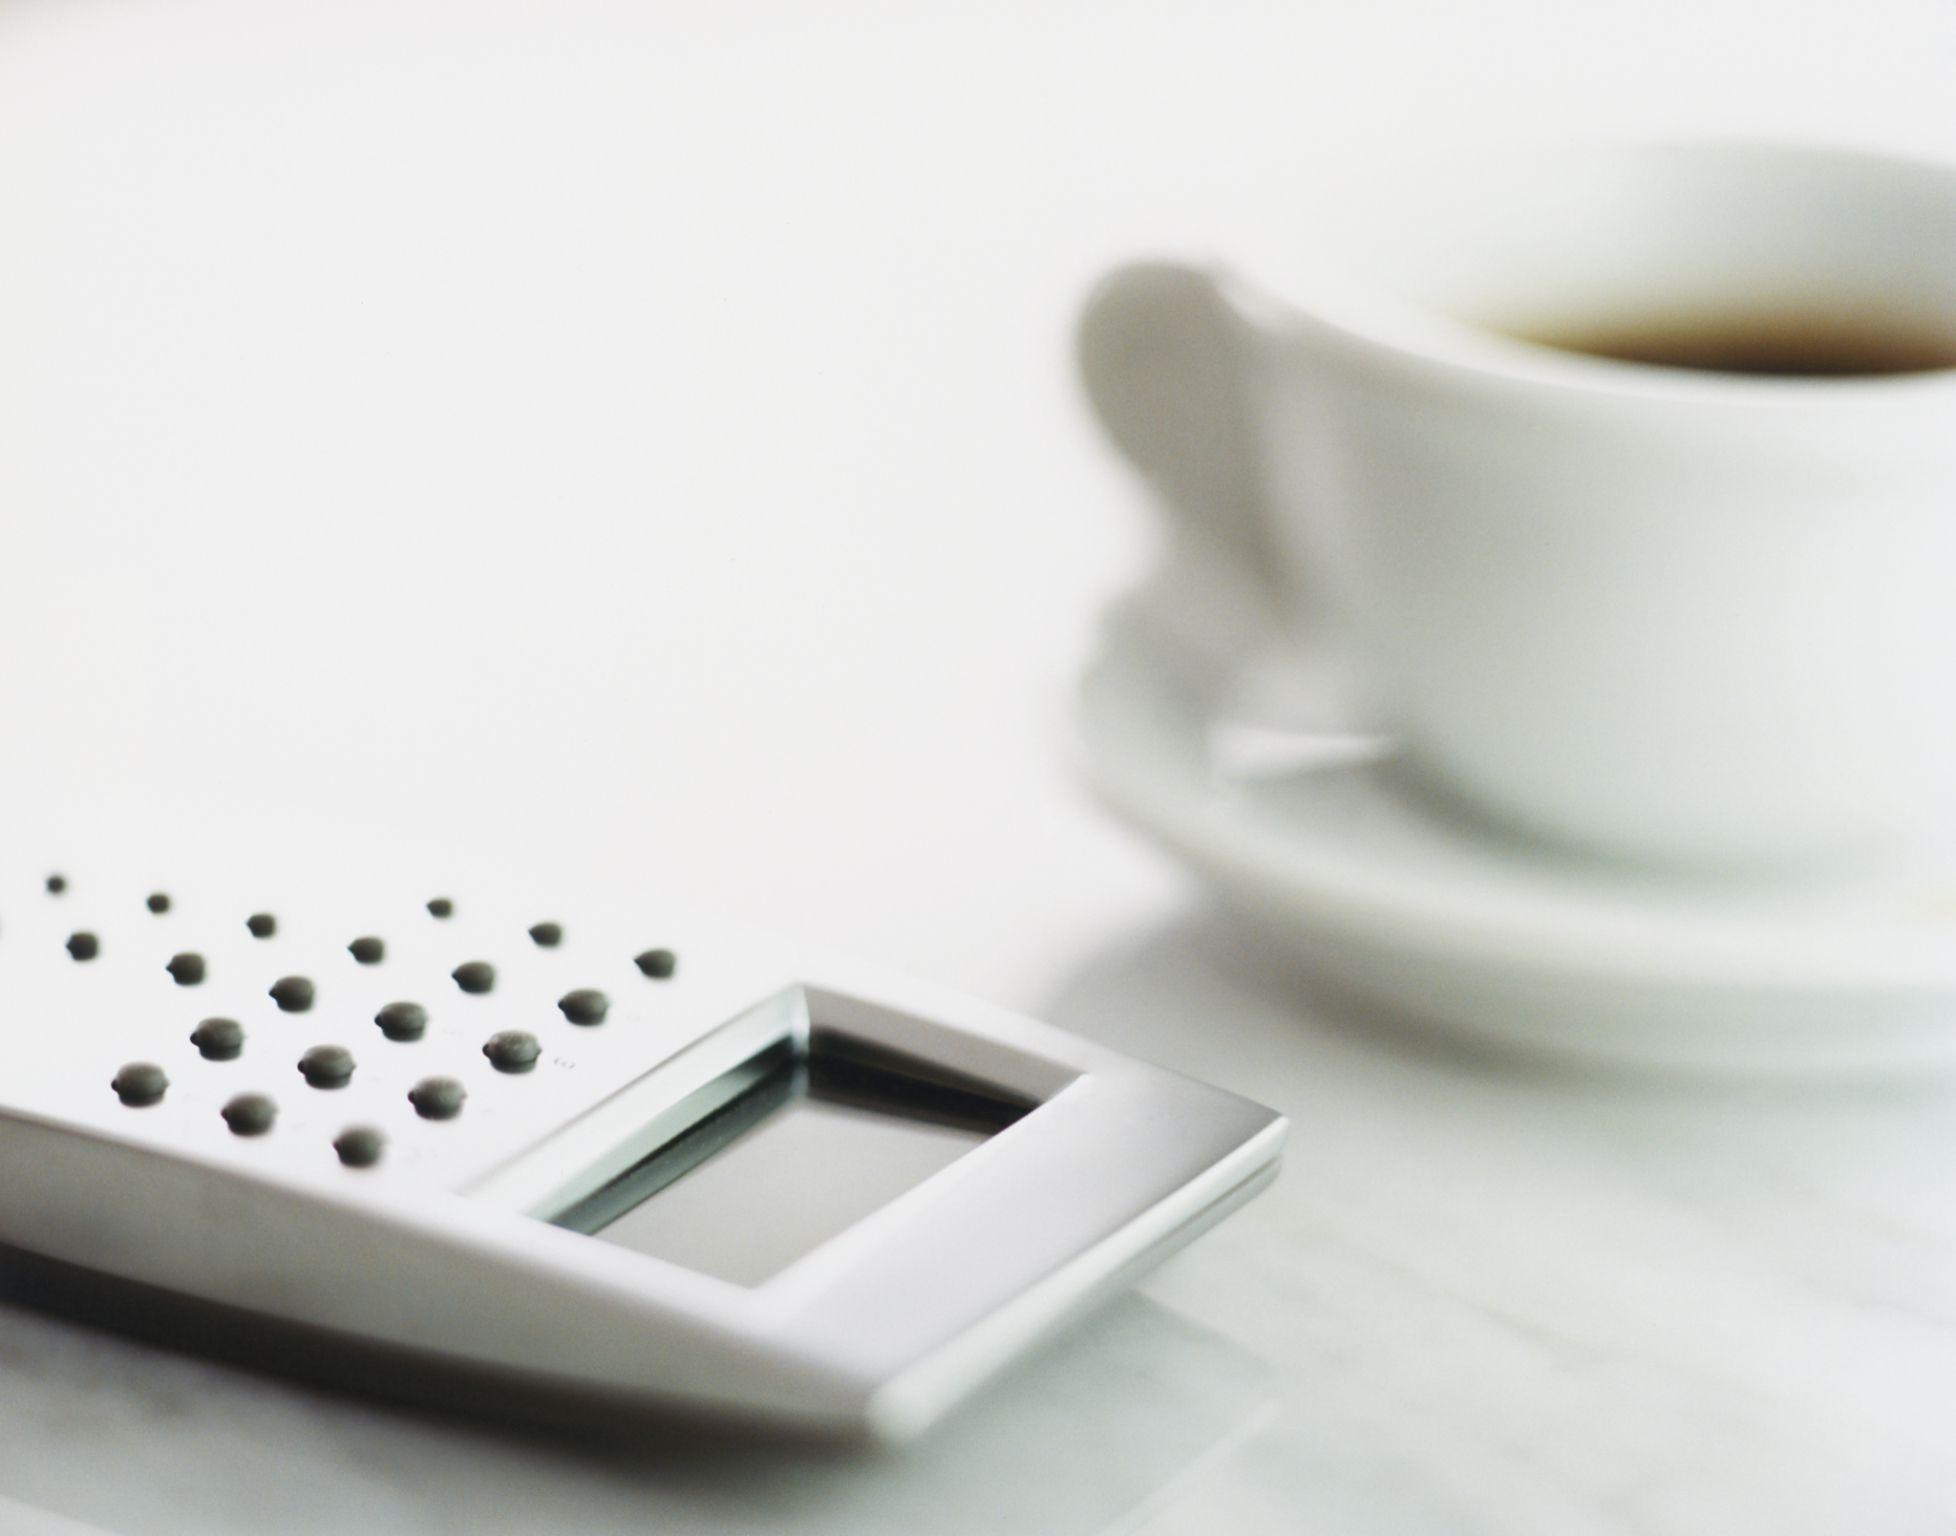 Coffee and Calculator